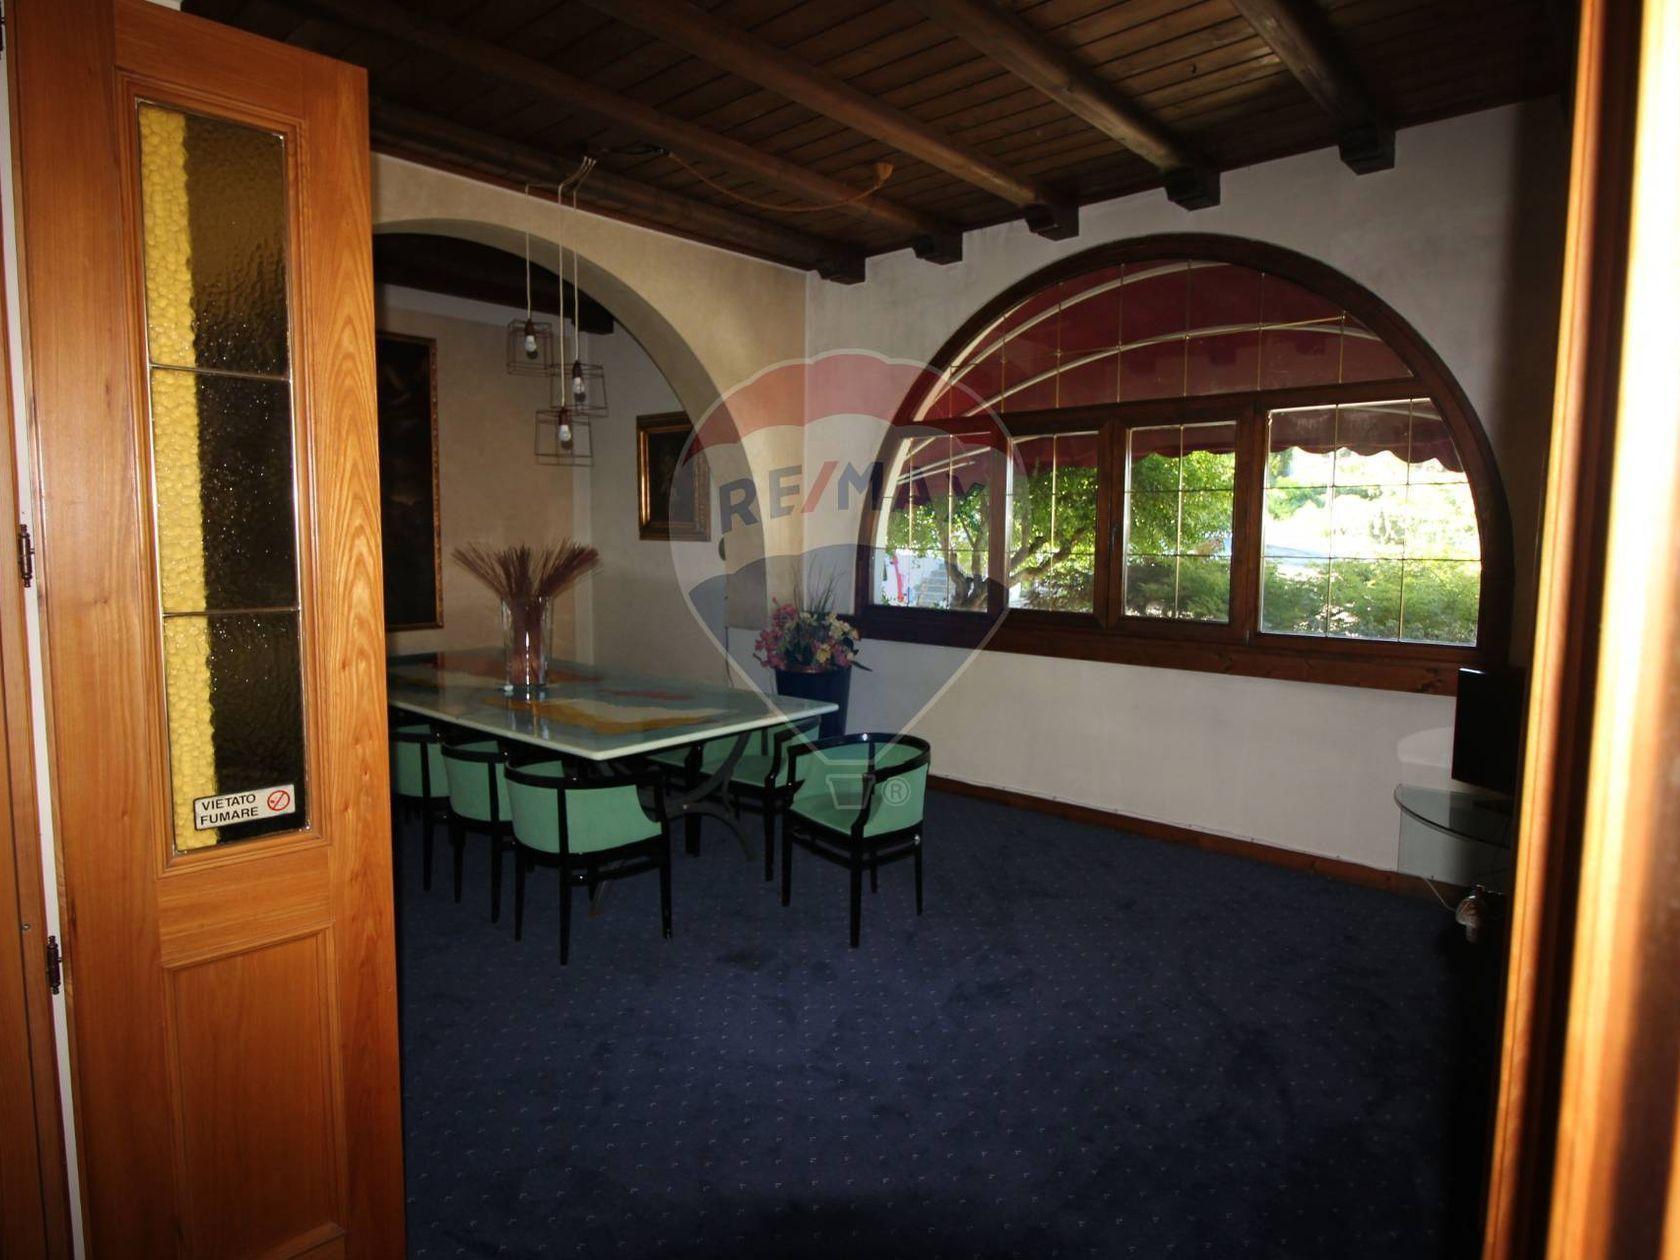 Albergo/Hotel Valmarana, Altavilla Vicentina, VI Vendita - Foto 24